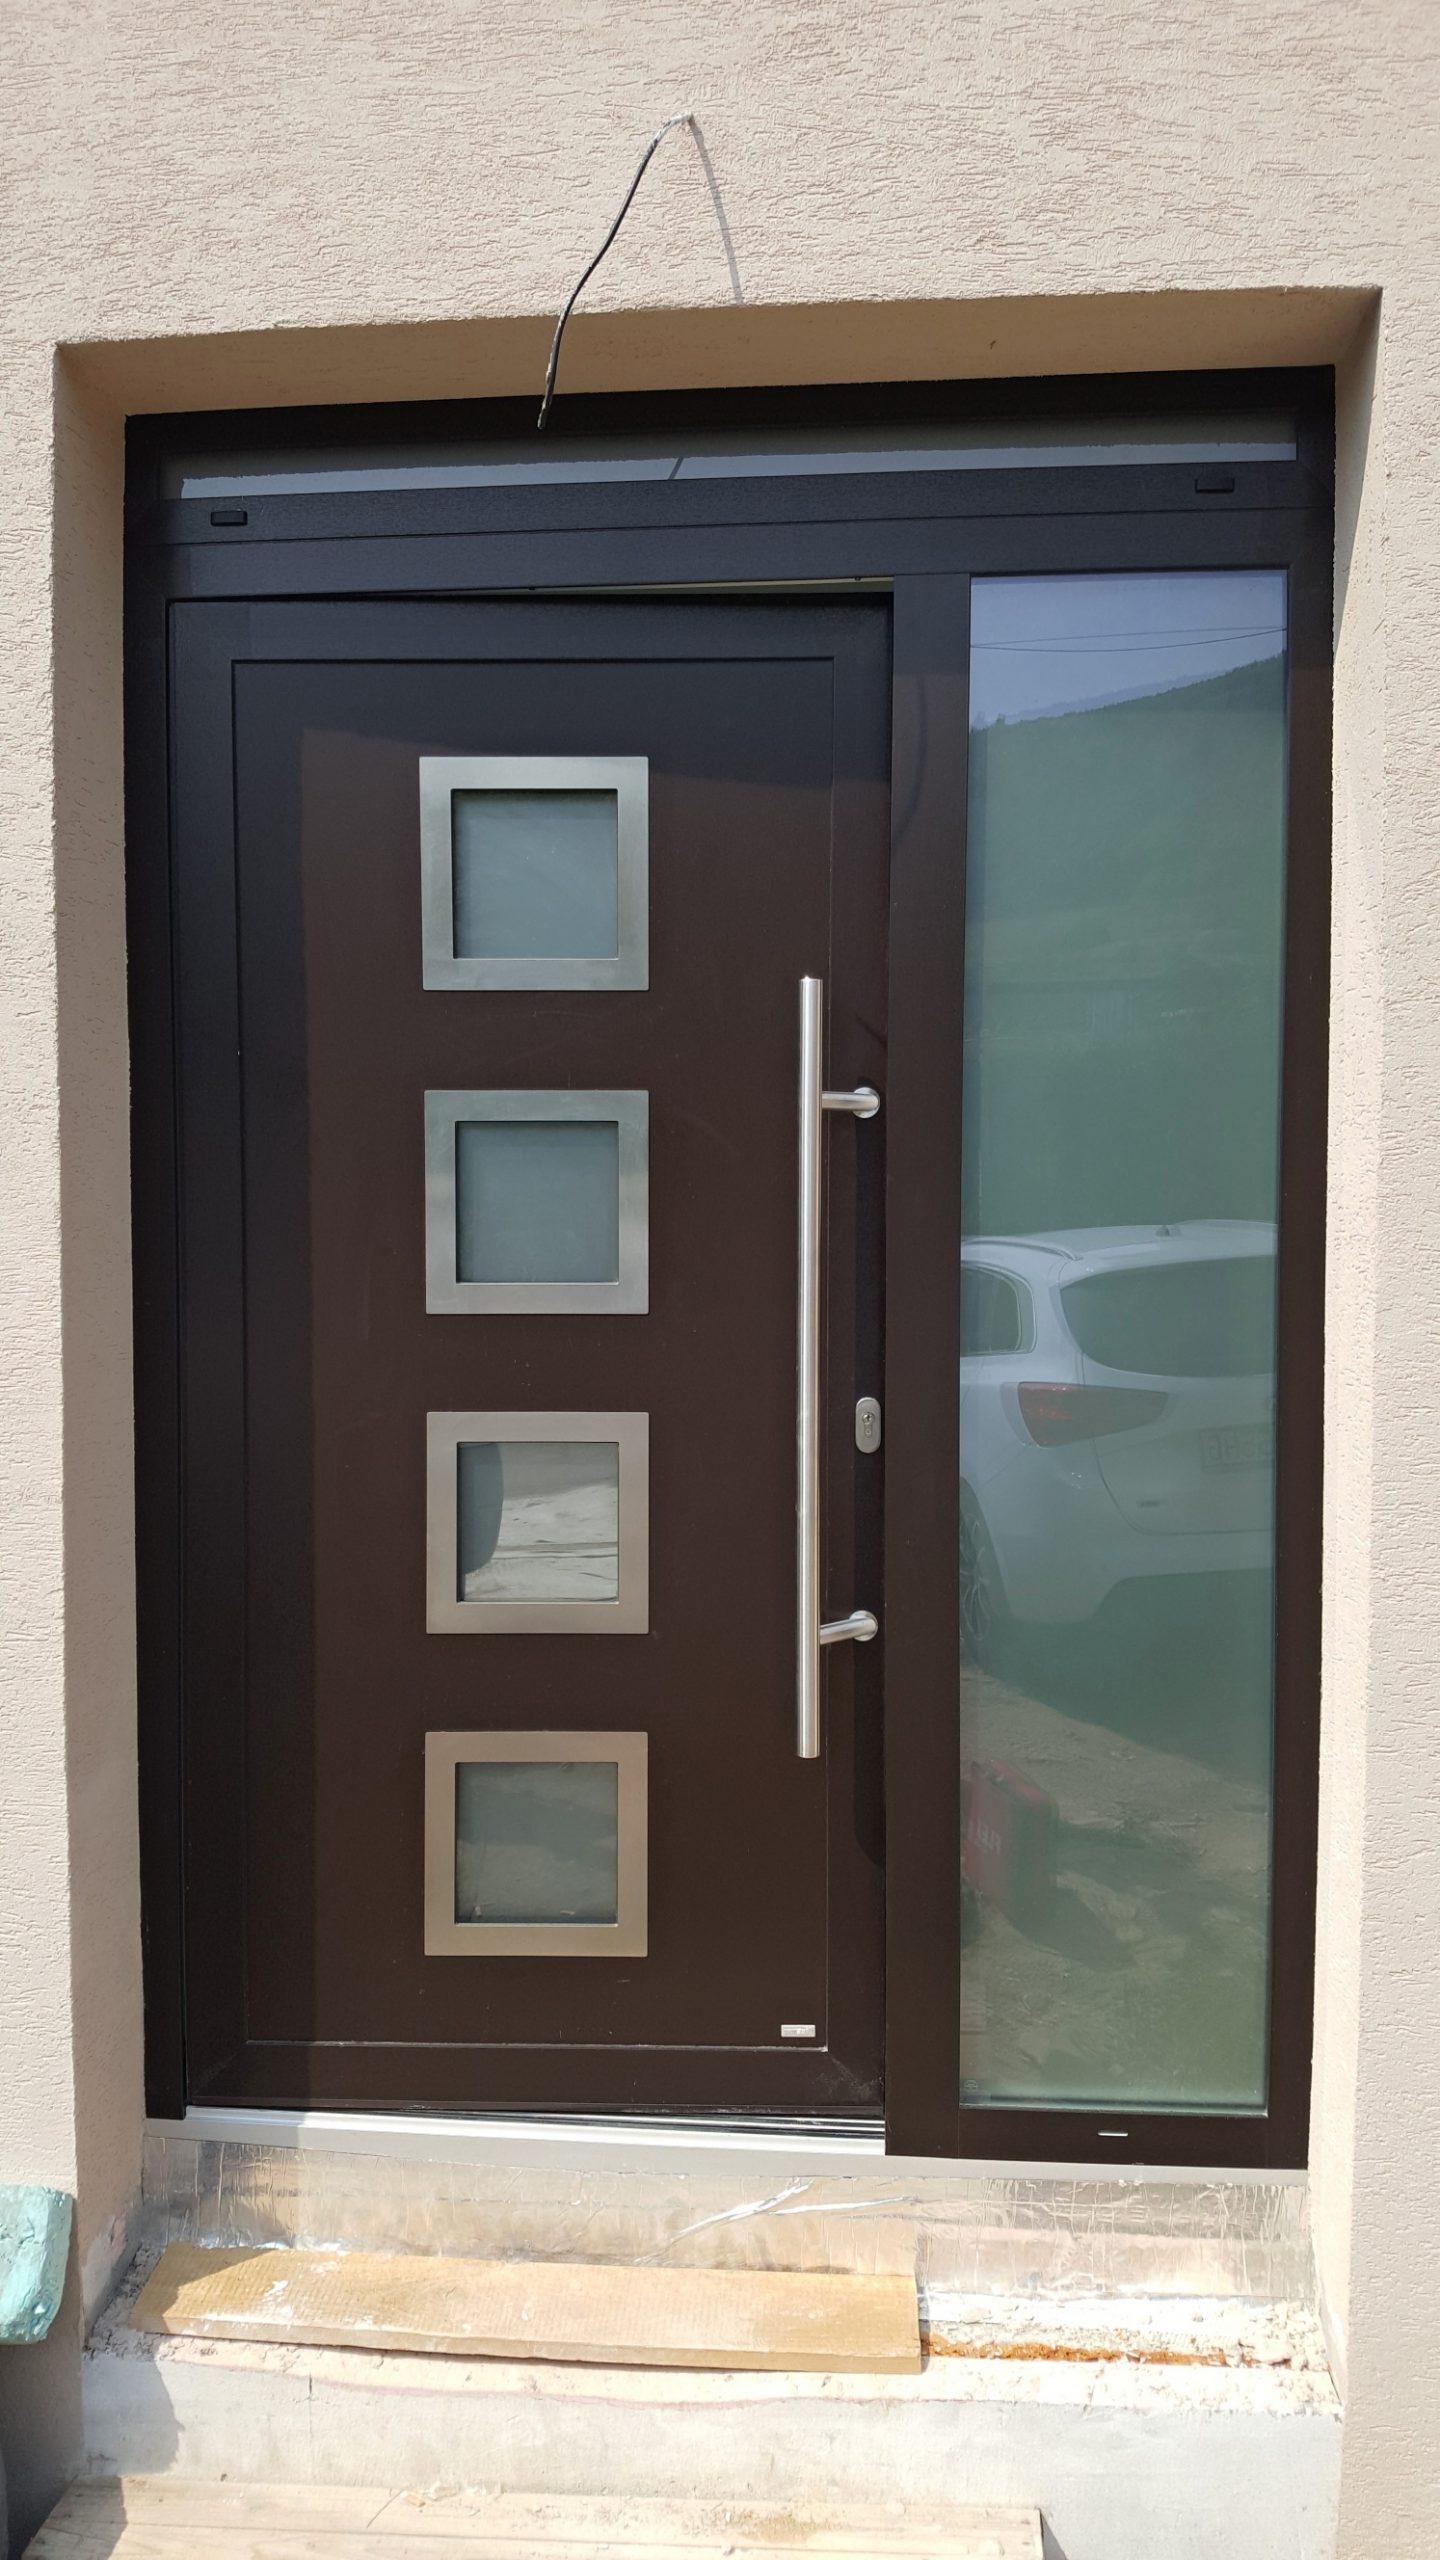 Hliníkové vchodové dvere s dvernou výplňou a madlom Nová Baňa